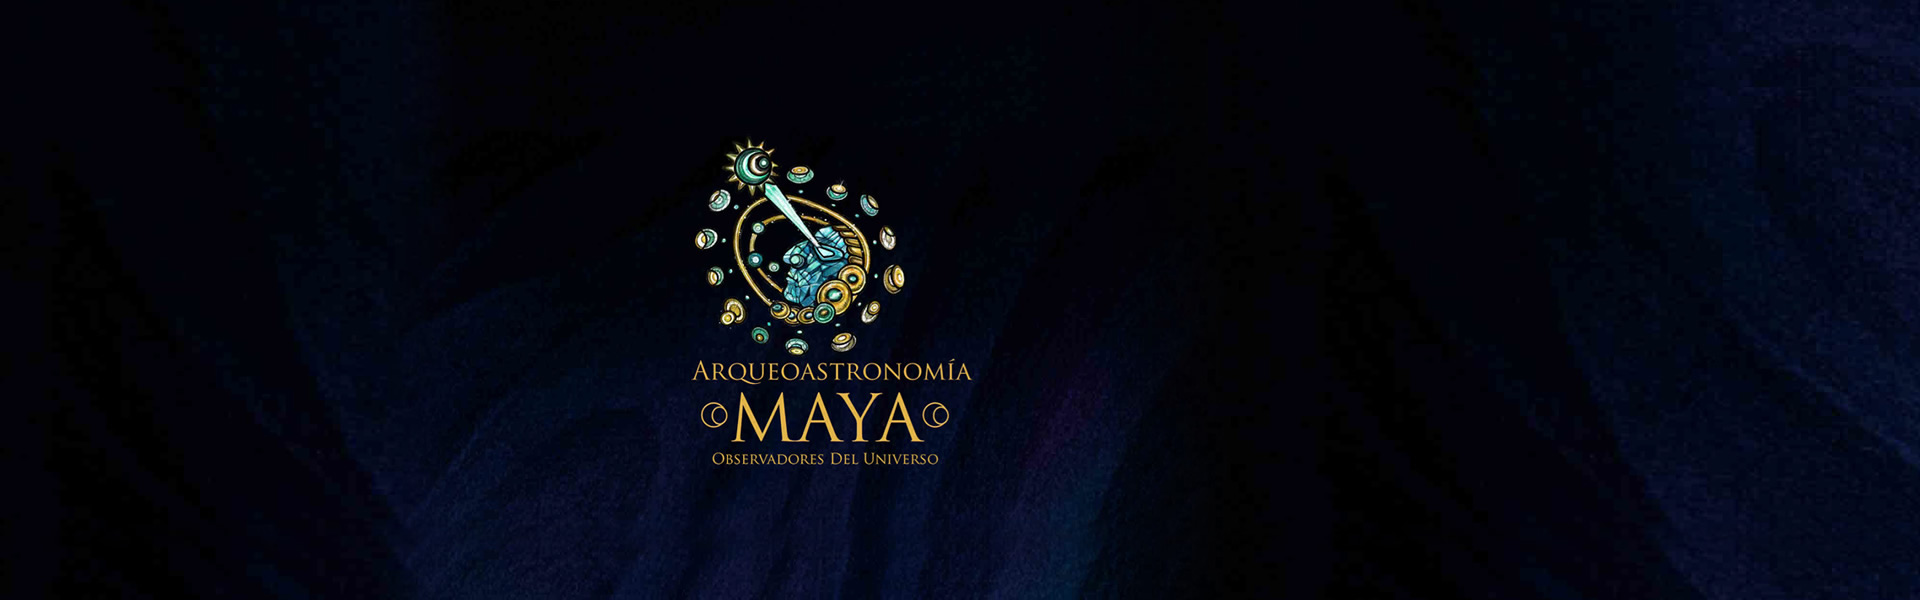 slider_Arqueoastronomia-Maya